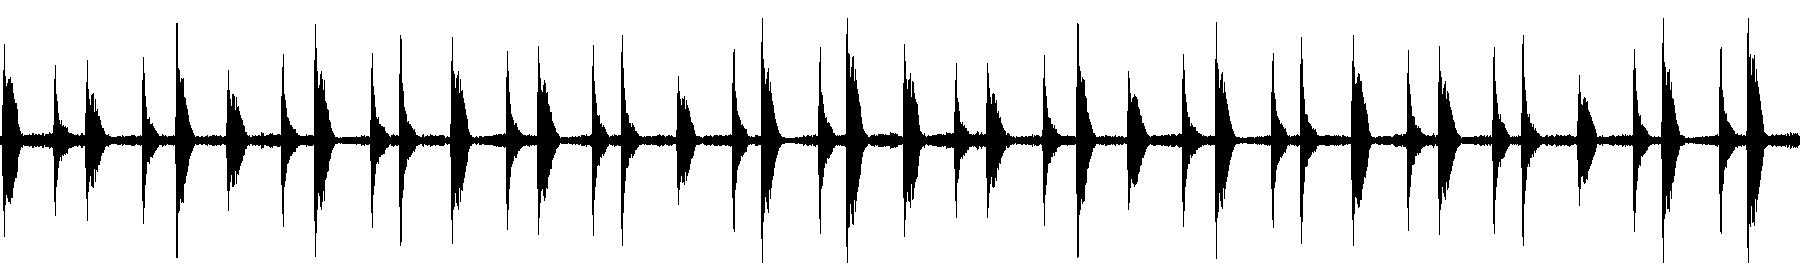 pth synth 07